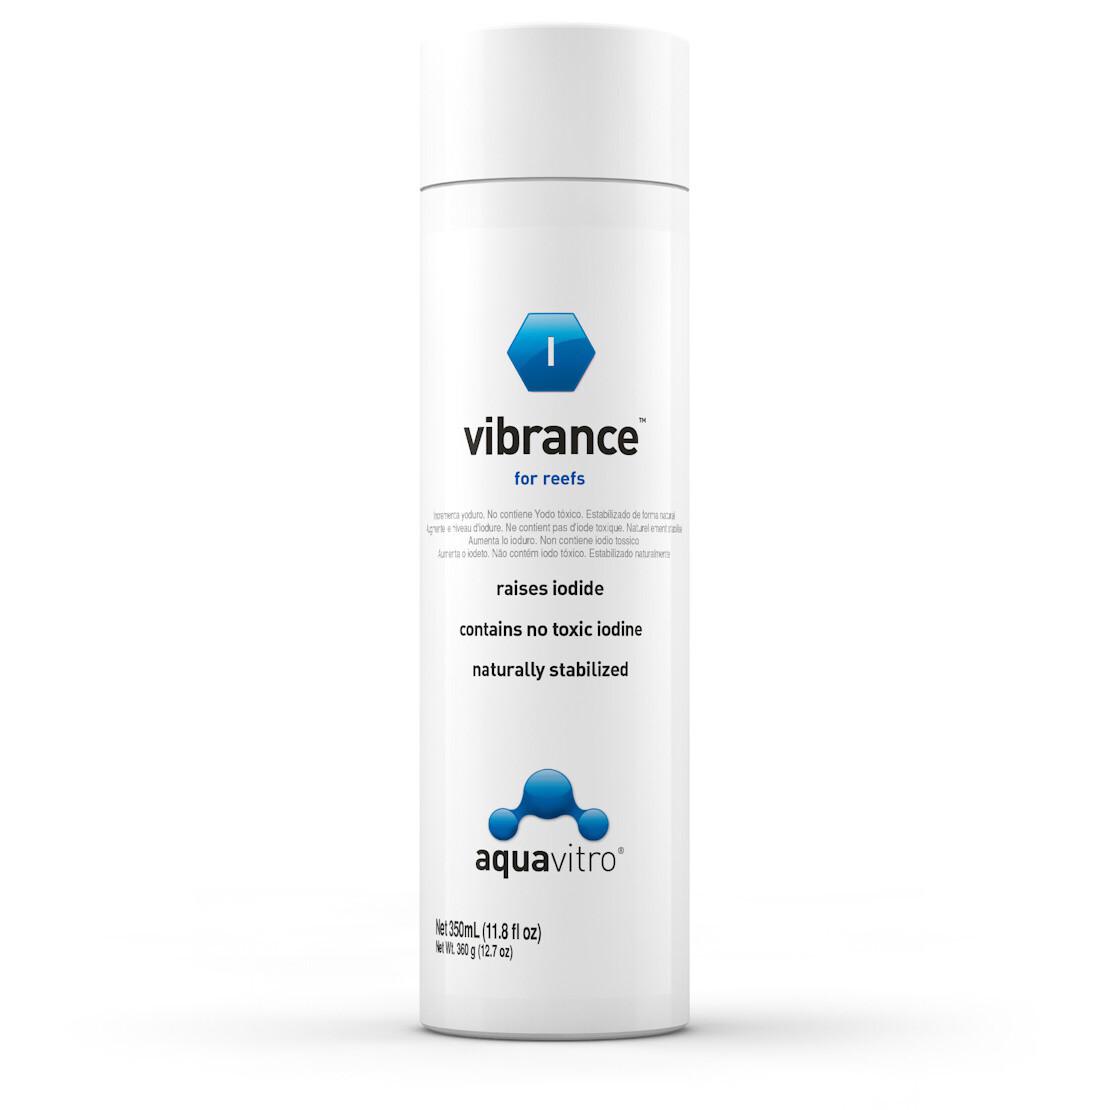 AquaVitro Vibrance 350ml